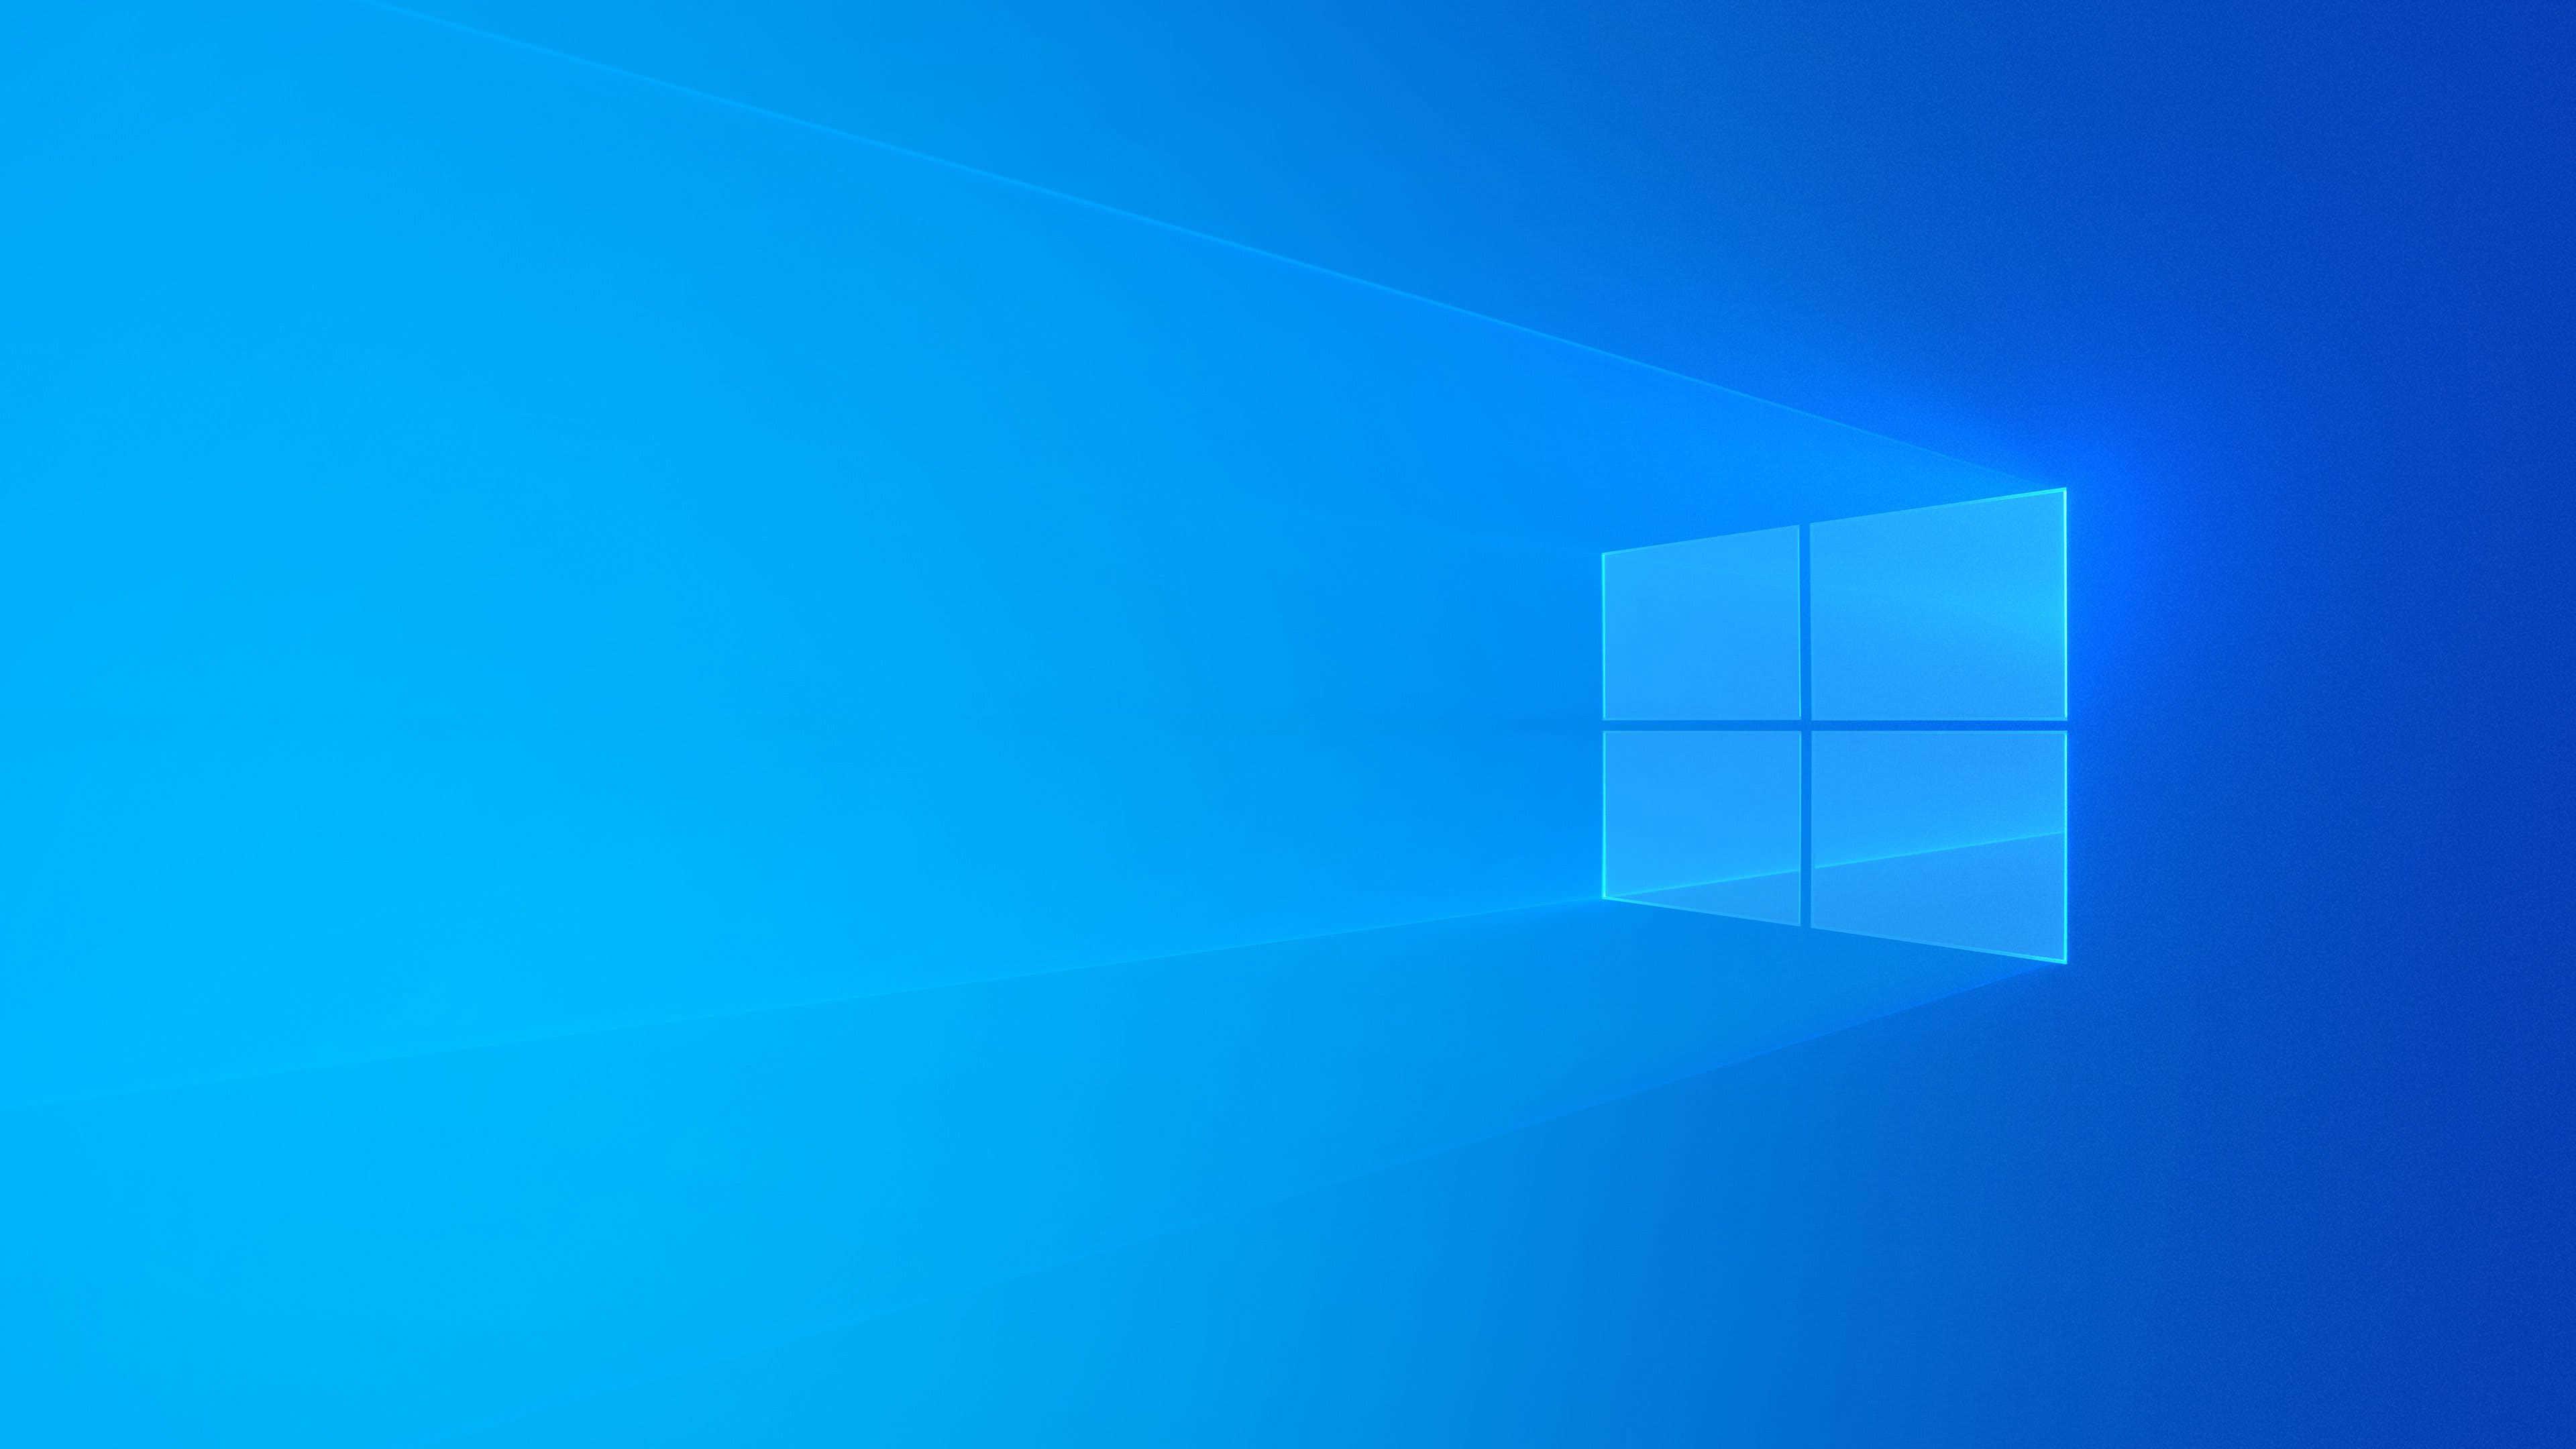 Windows 4k Wallpapers Top Free Windows 4k Backgrounds